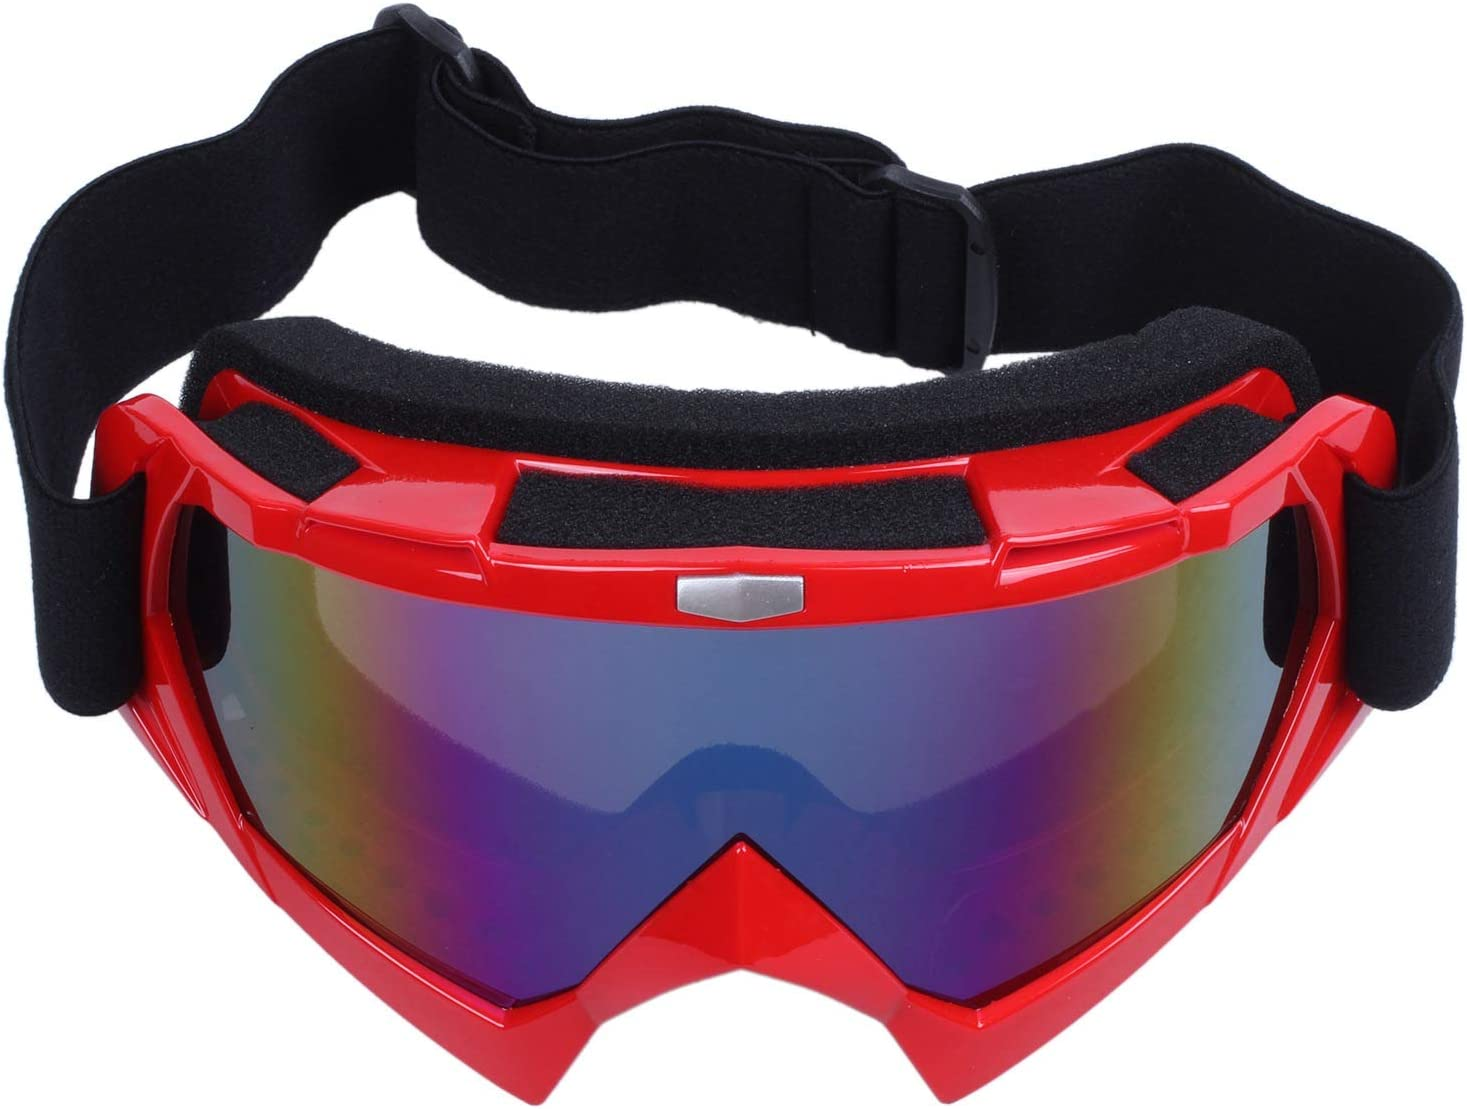 wivarra Single Lens Motocross off-Road ATV Dirt Bike Occhiali da Sci Occhiali da Vista Rosso